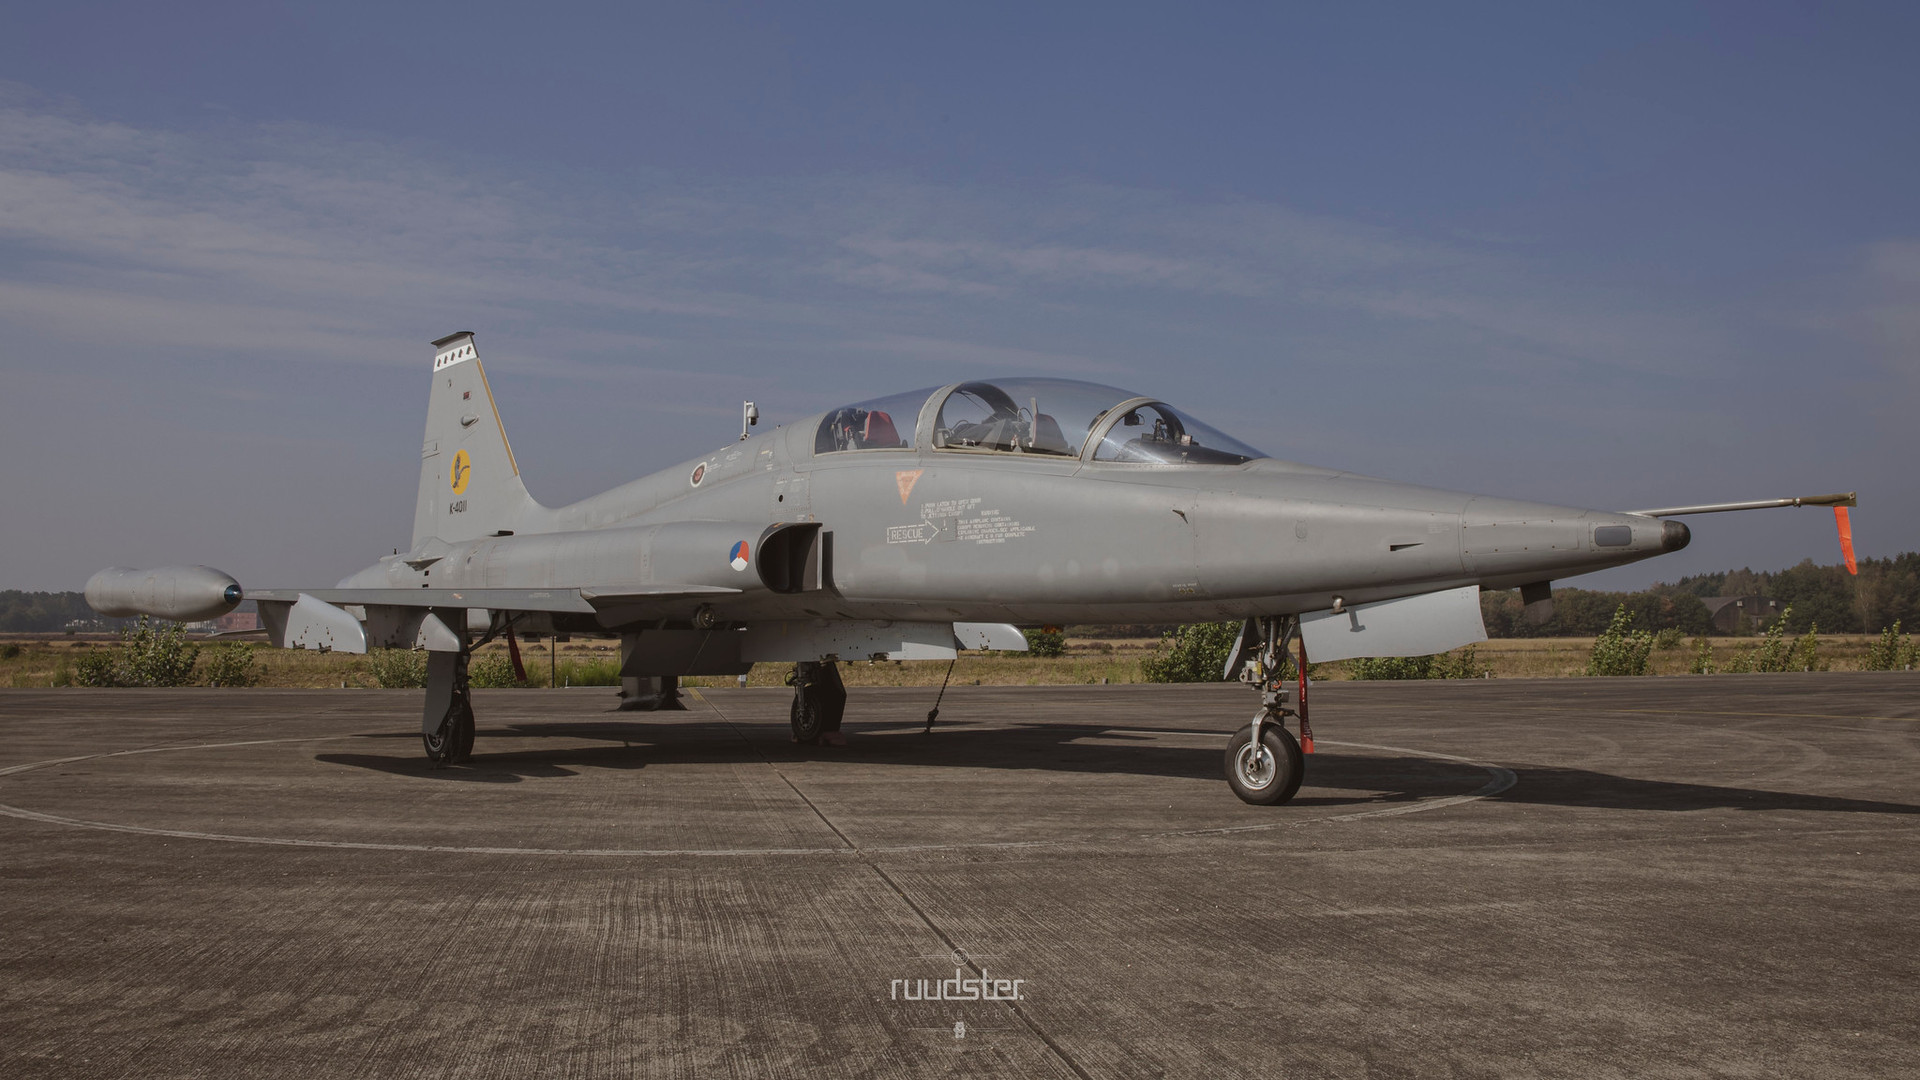 K-4011   Build: 1969 - Northrop NF-5B Freedom Fighter